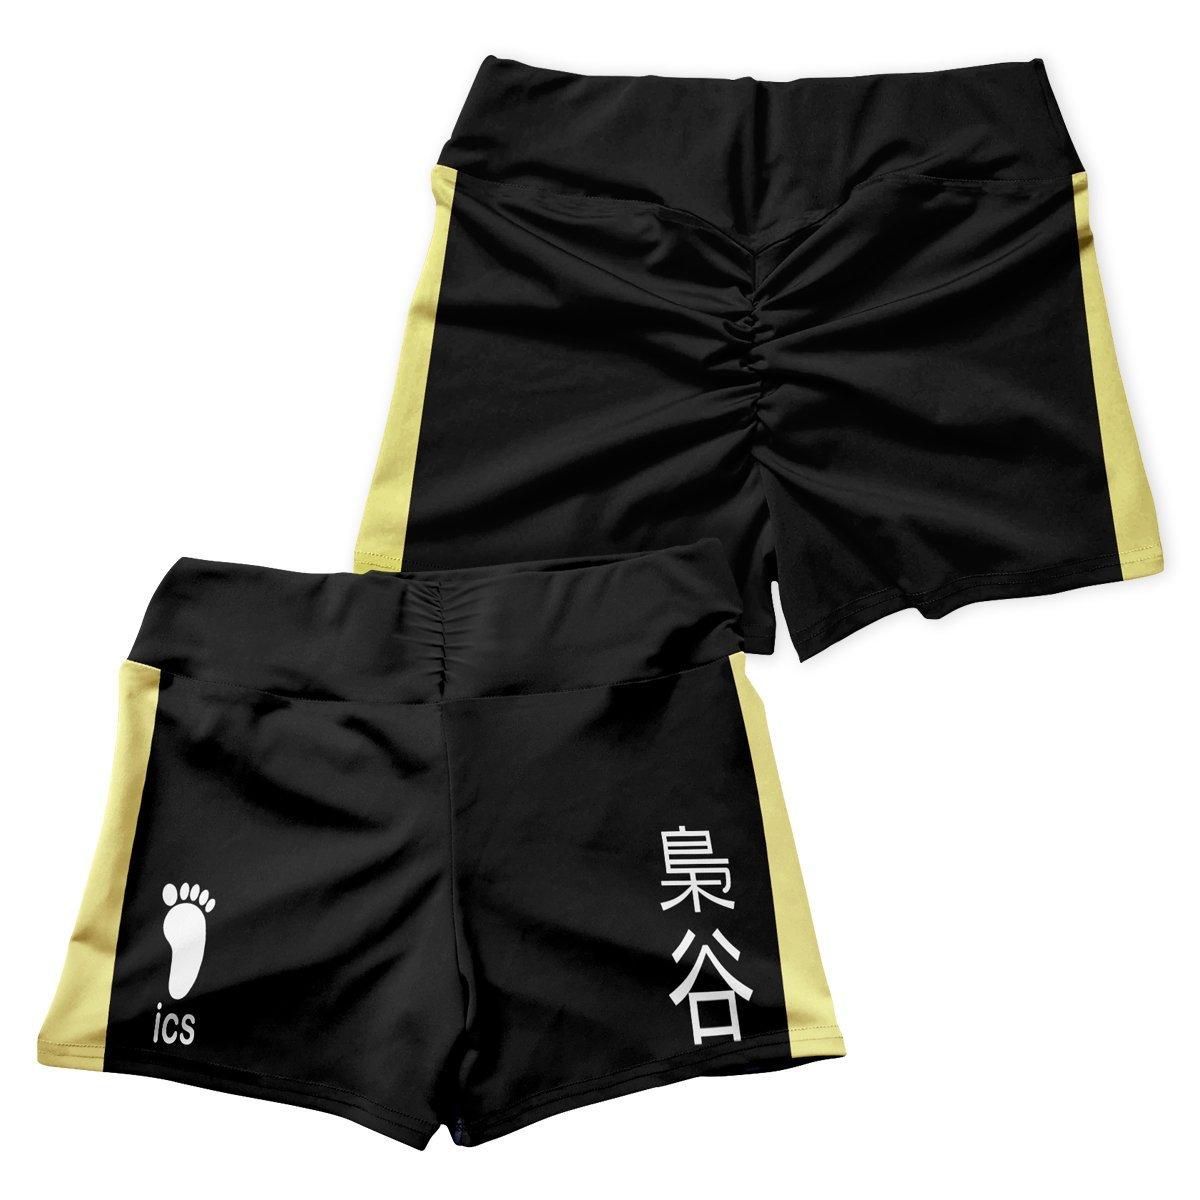 team fukurodani active wear set 672332 - Anime Swimsuits